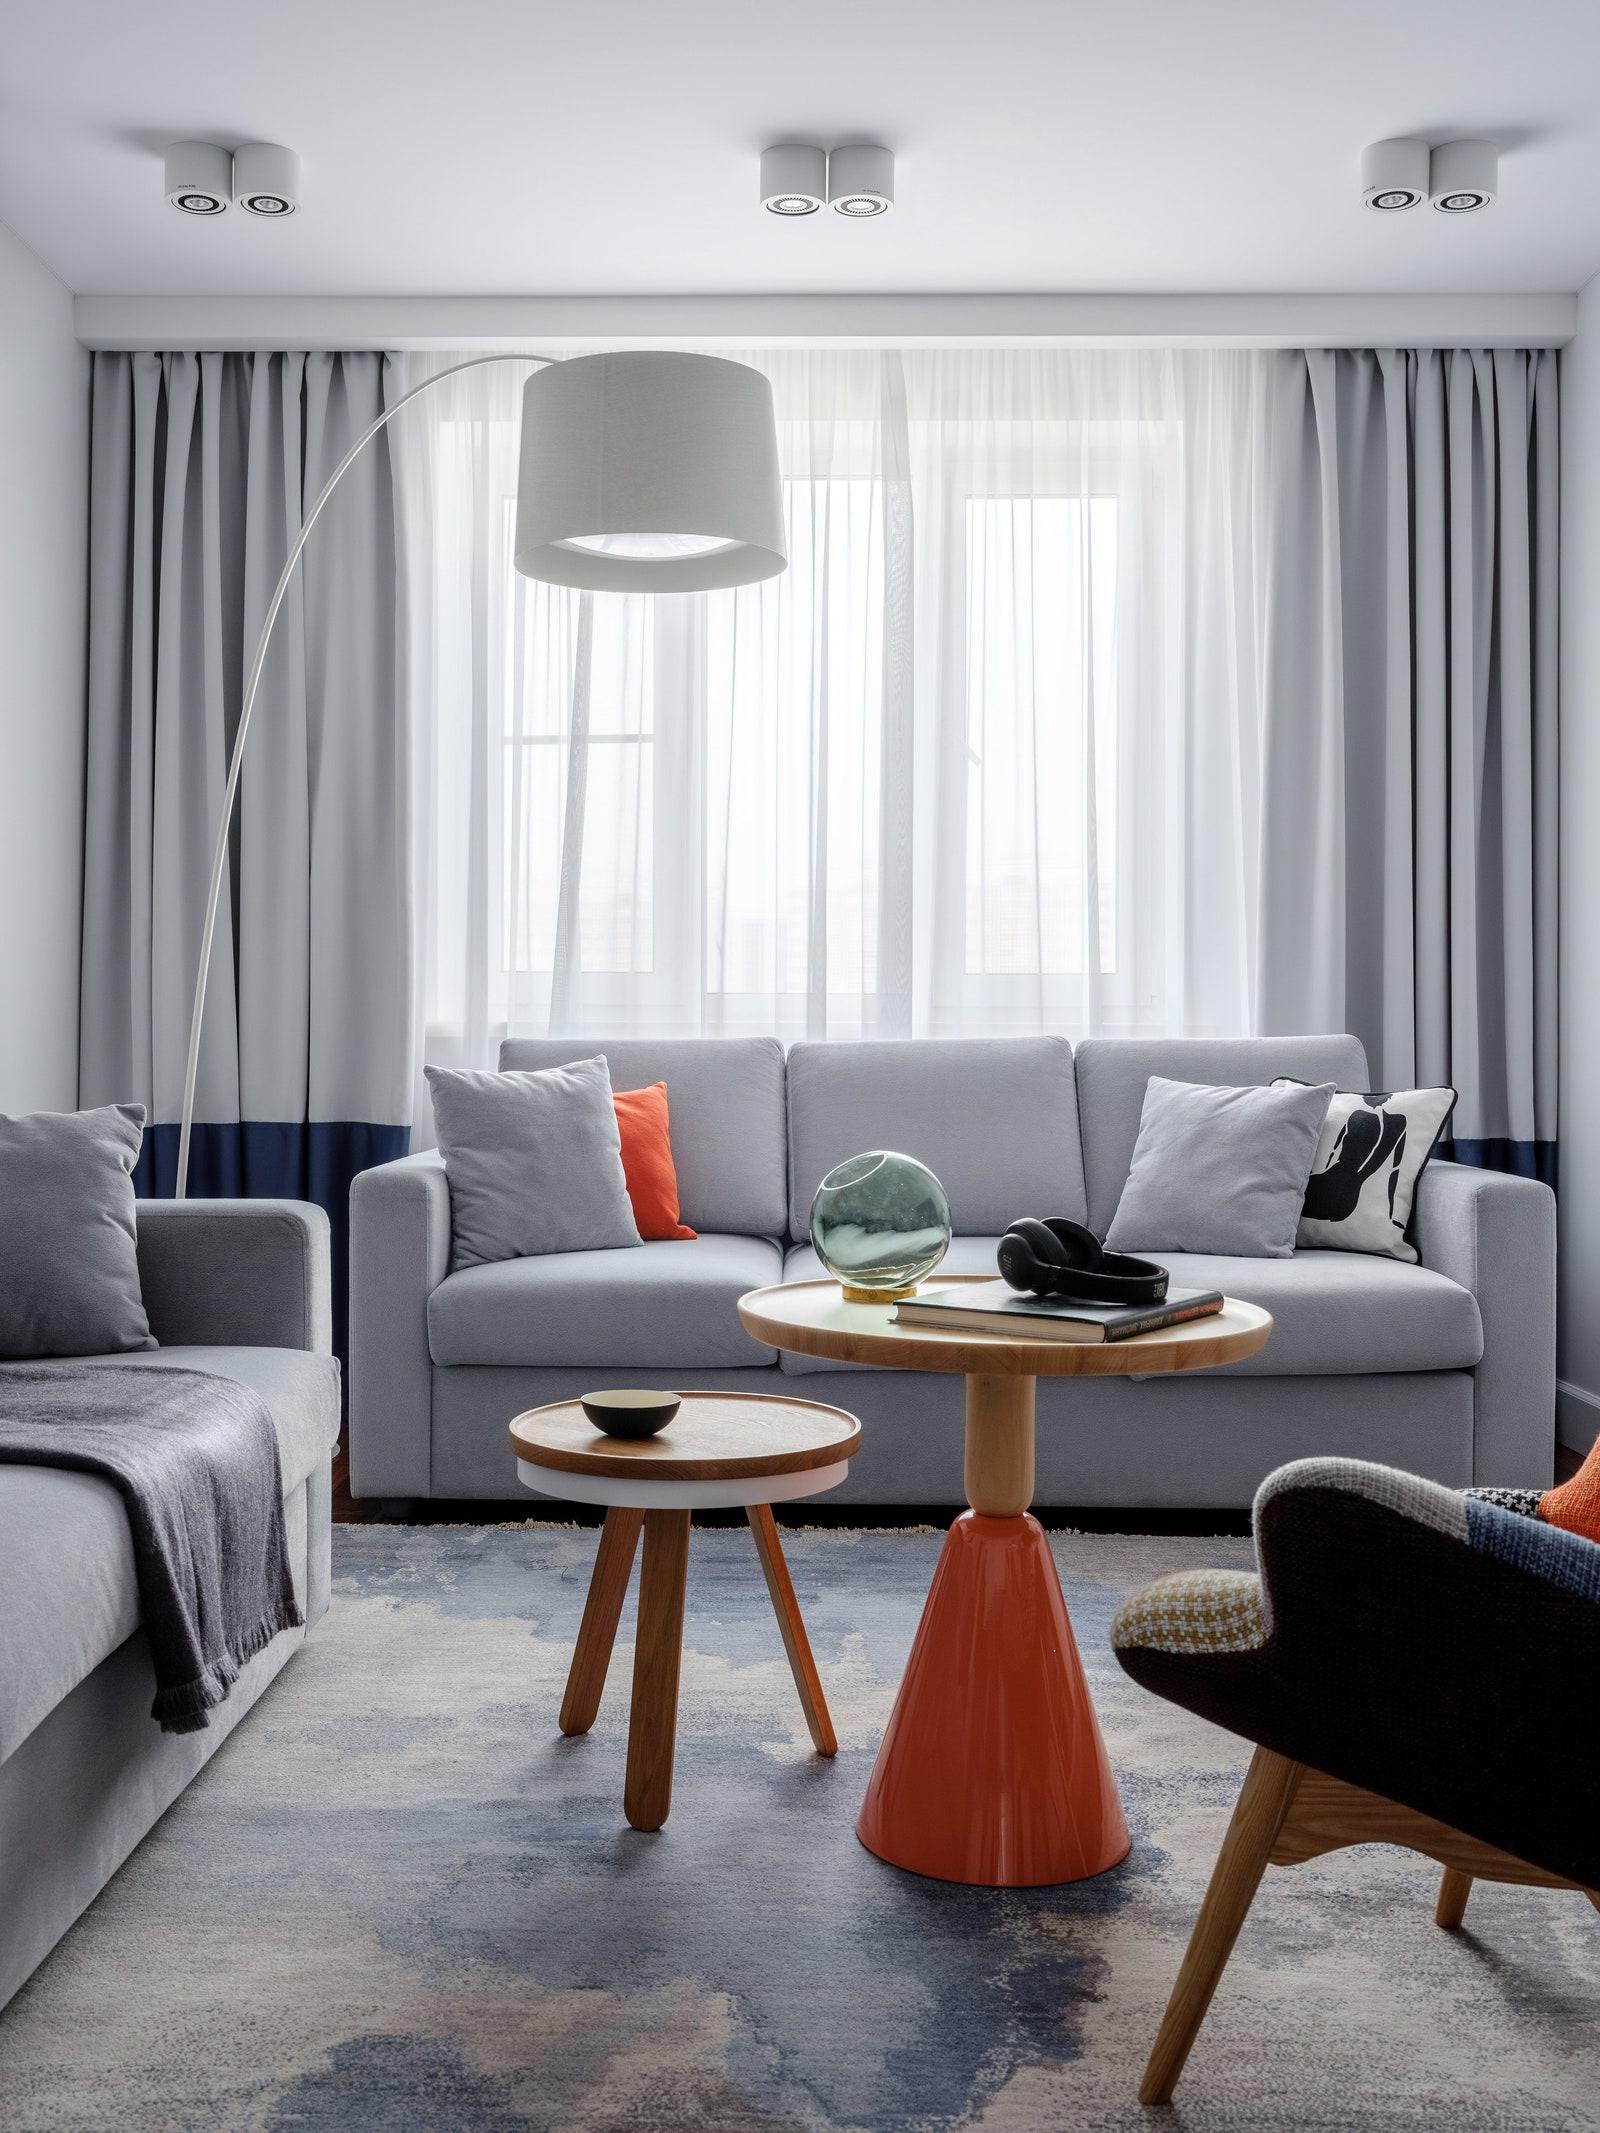 .  La Forma   Sancal  Barcelona Design.  Dovlet House  Happy ollection  Foscarini.